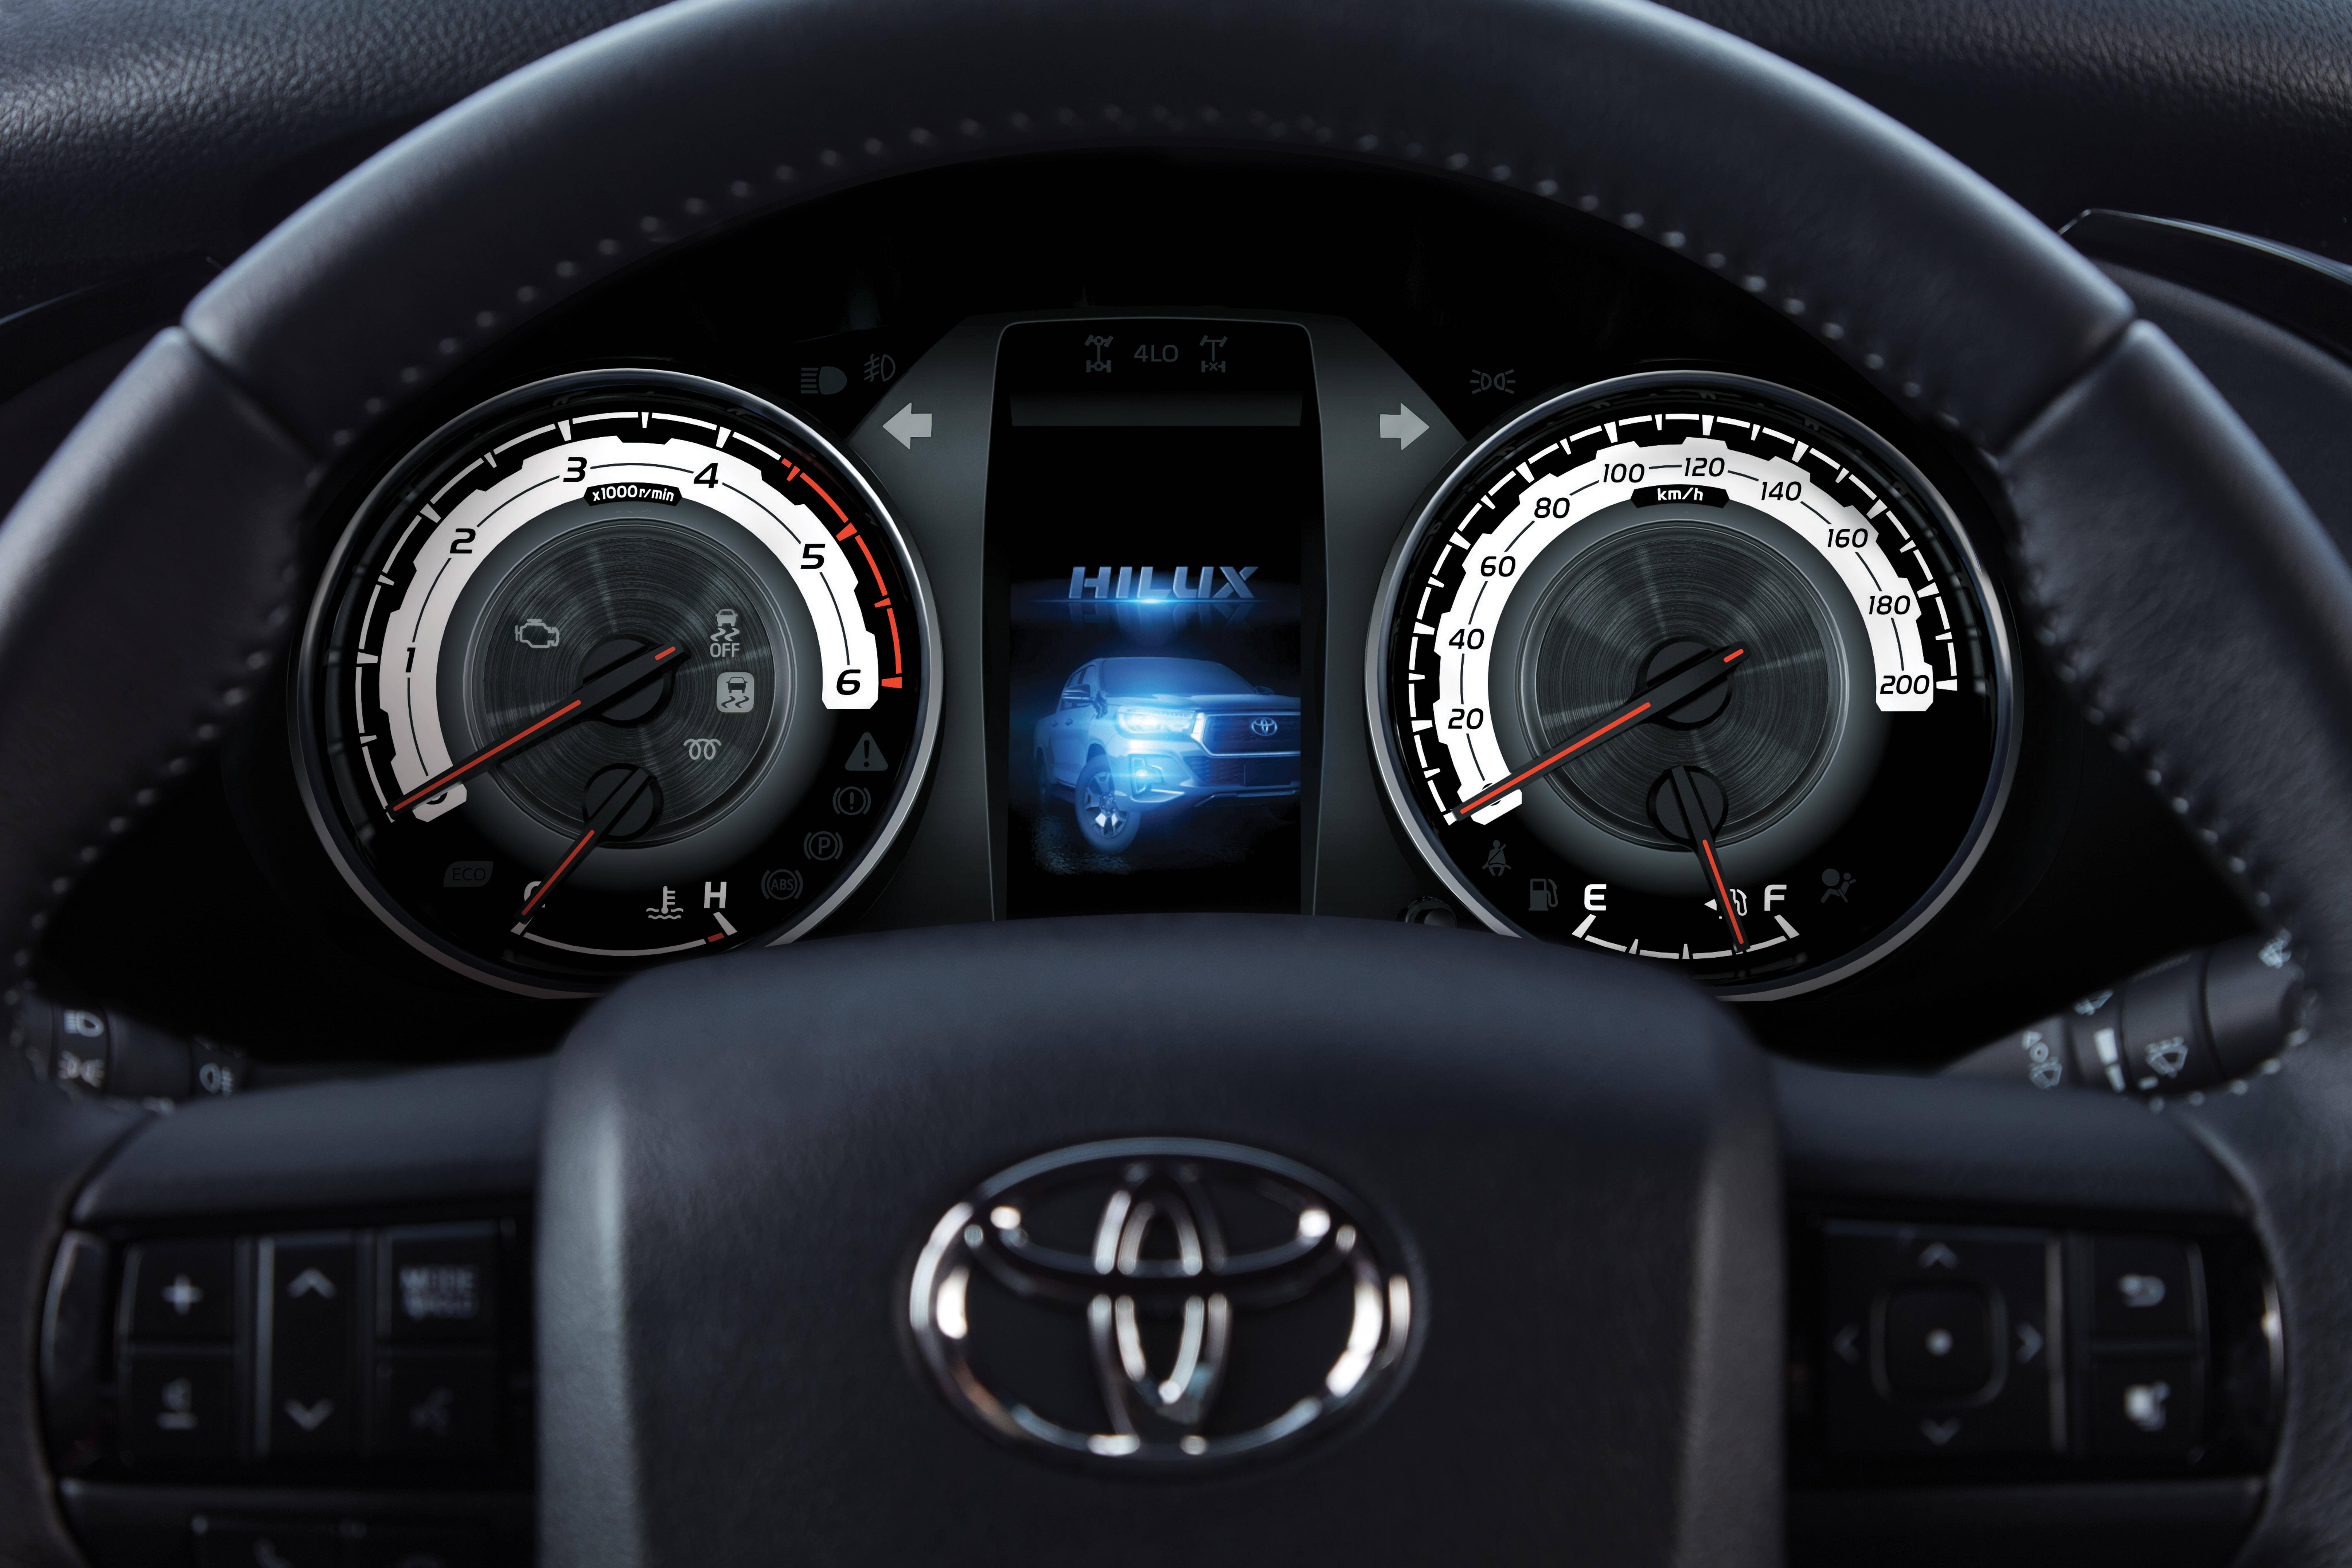 7. Toyota Hilux 2019